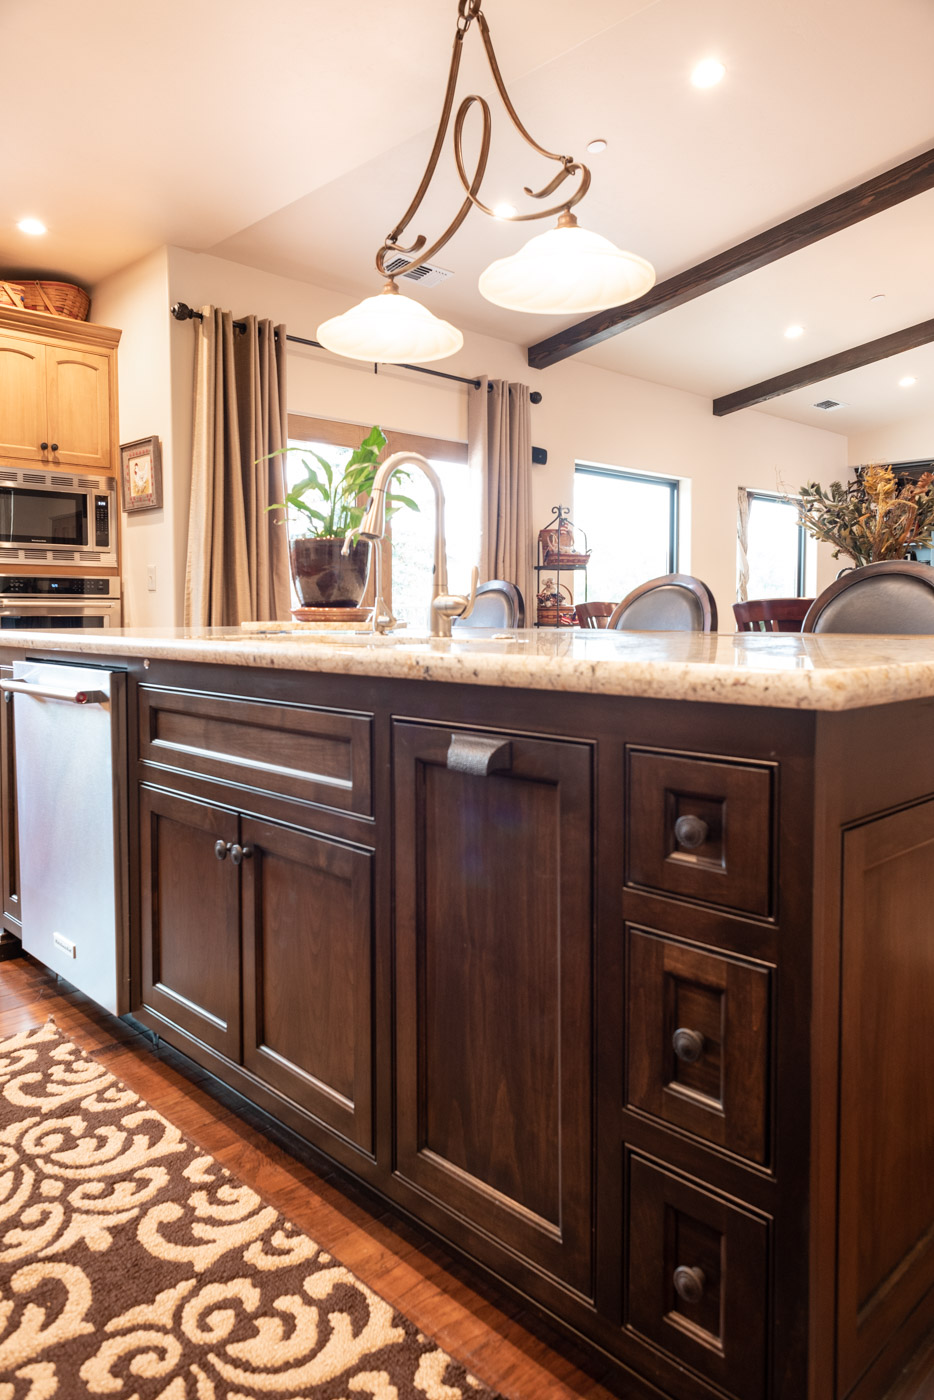 Tuscan Artisan custom stained Alder wood kitchen island